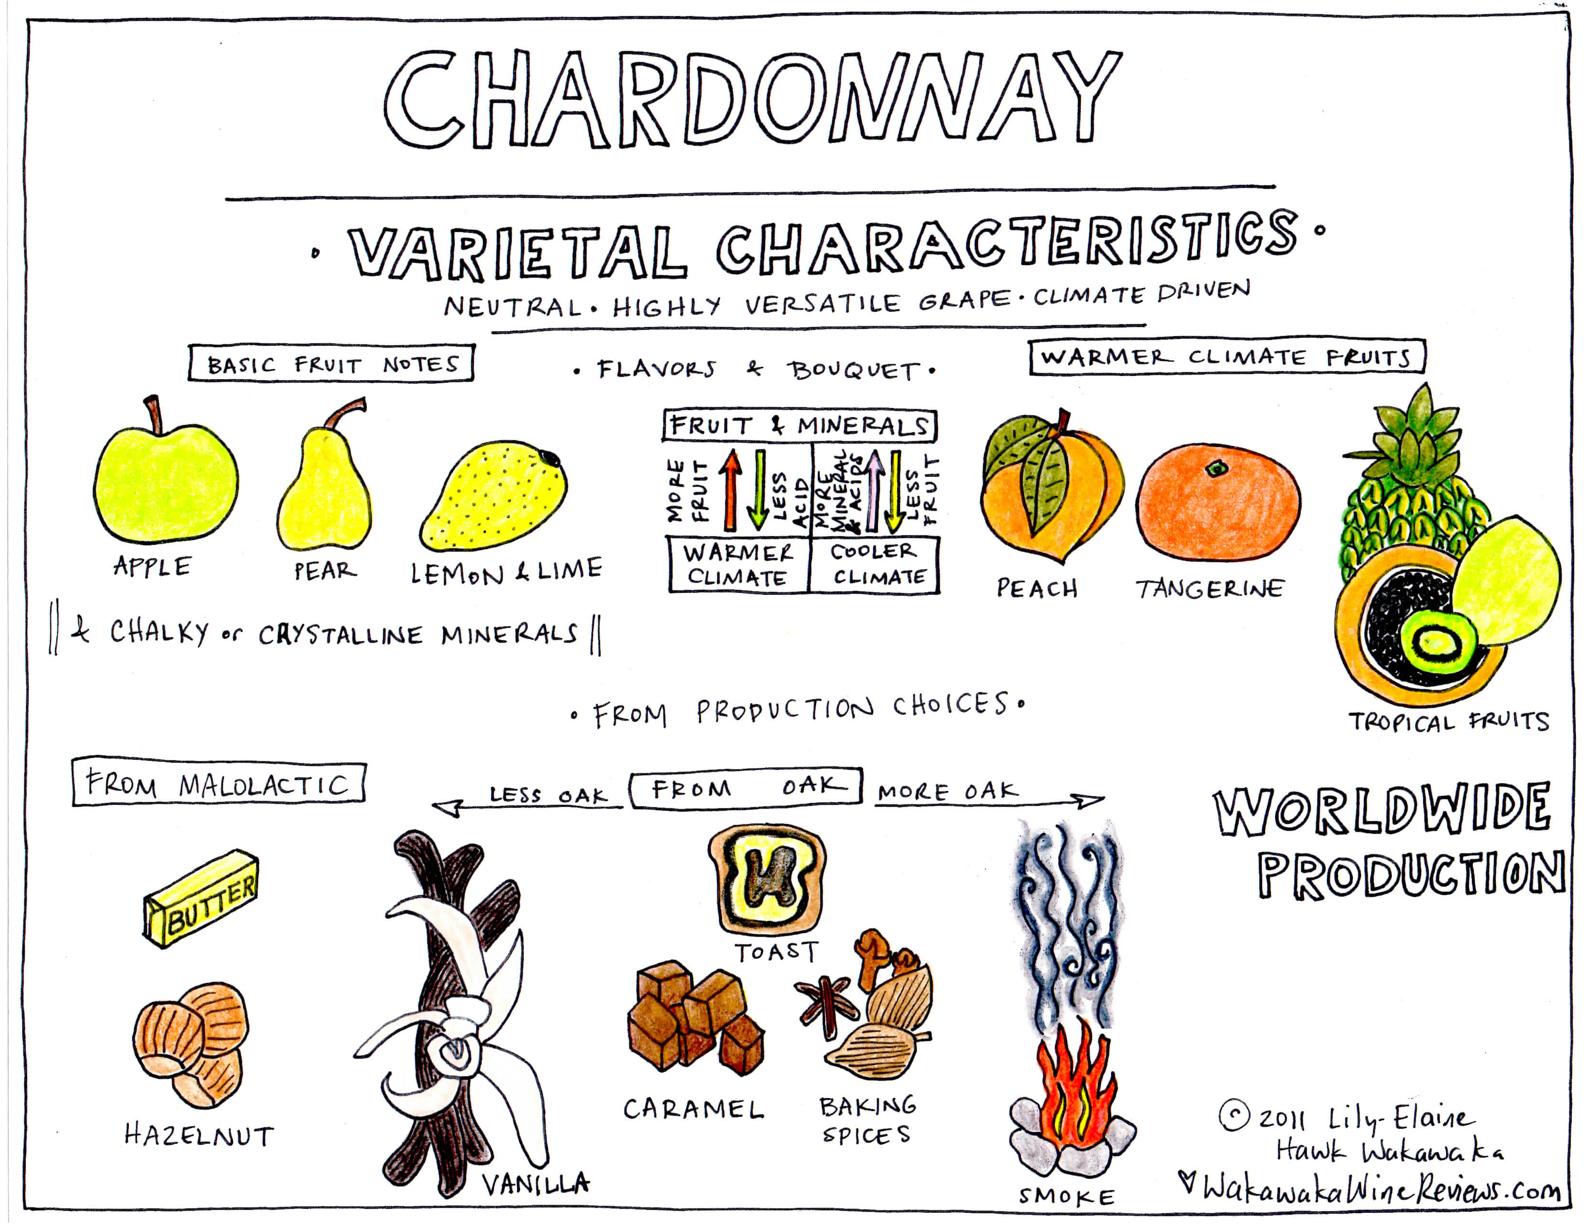 chardonnayvarietalnotes.jpg